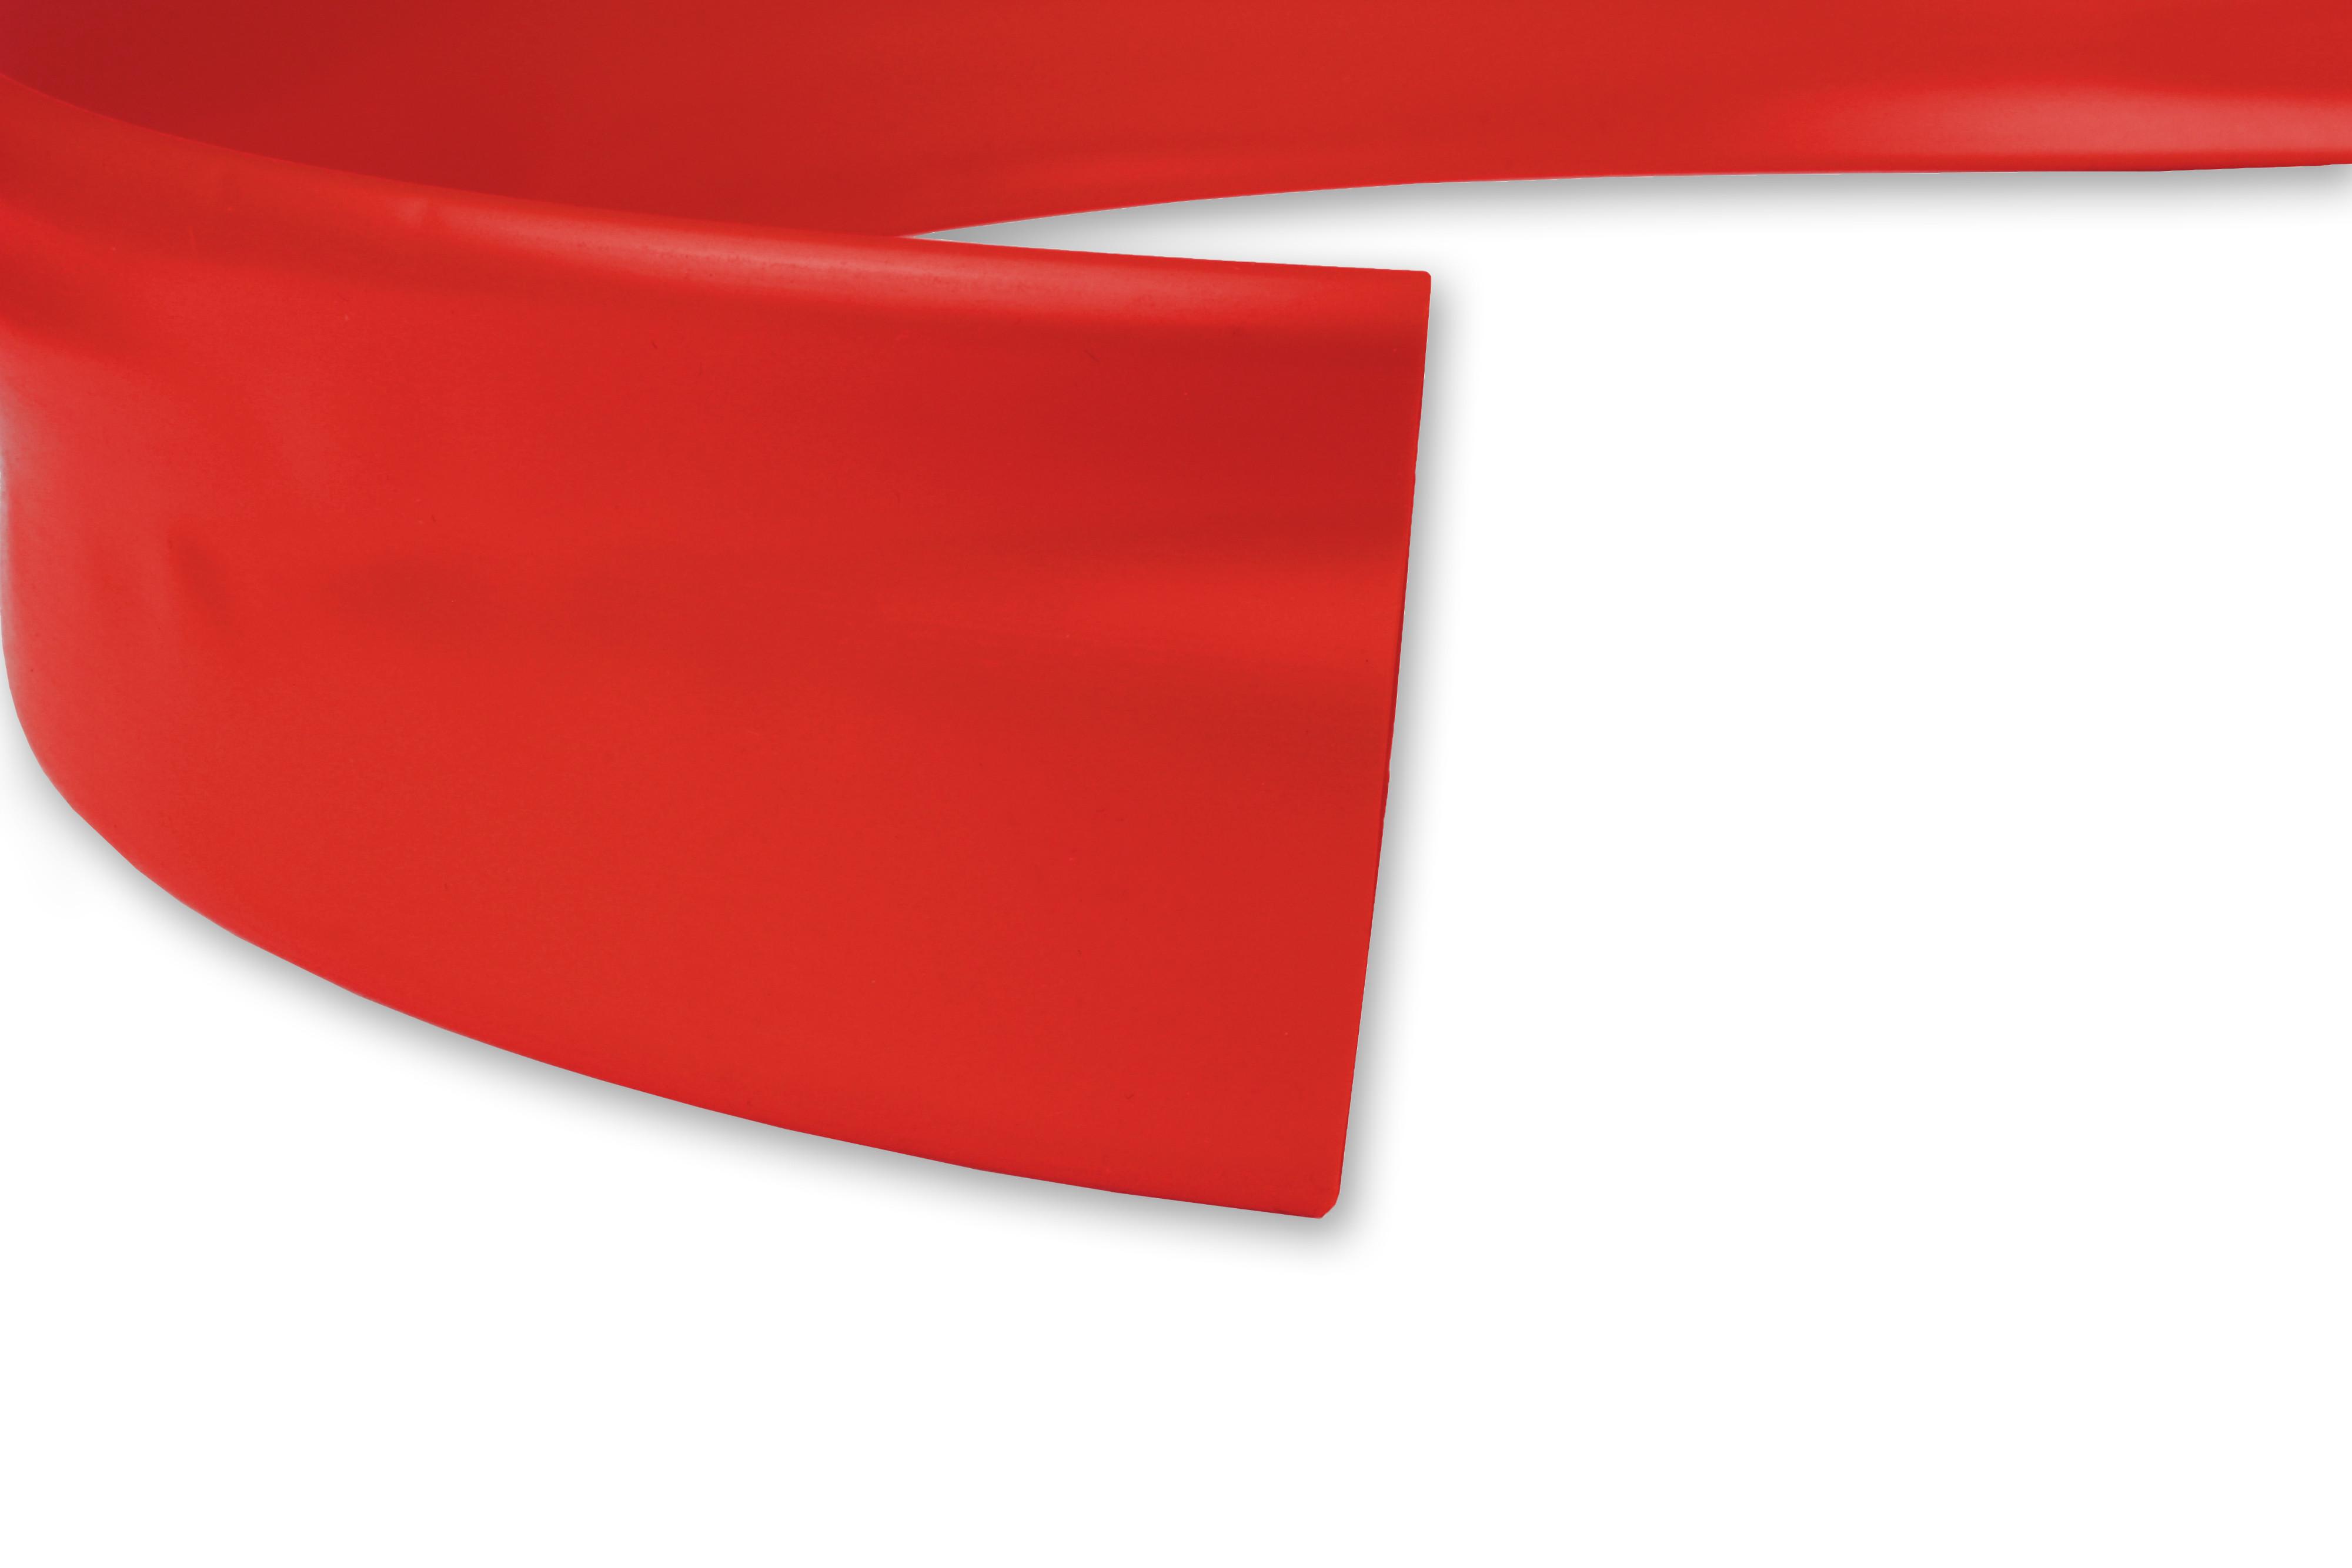 PVC Heat Shrink Tubing HPV Size 2.4mm I.D / 1.2mm I.D Red